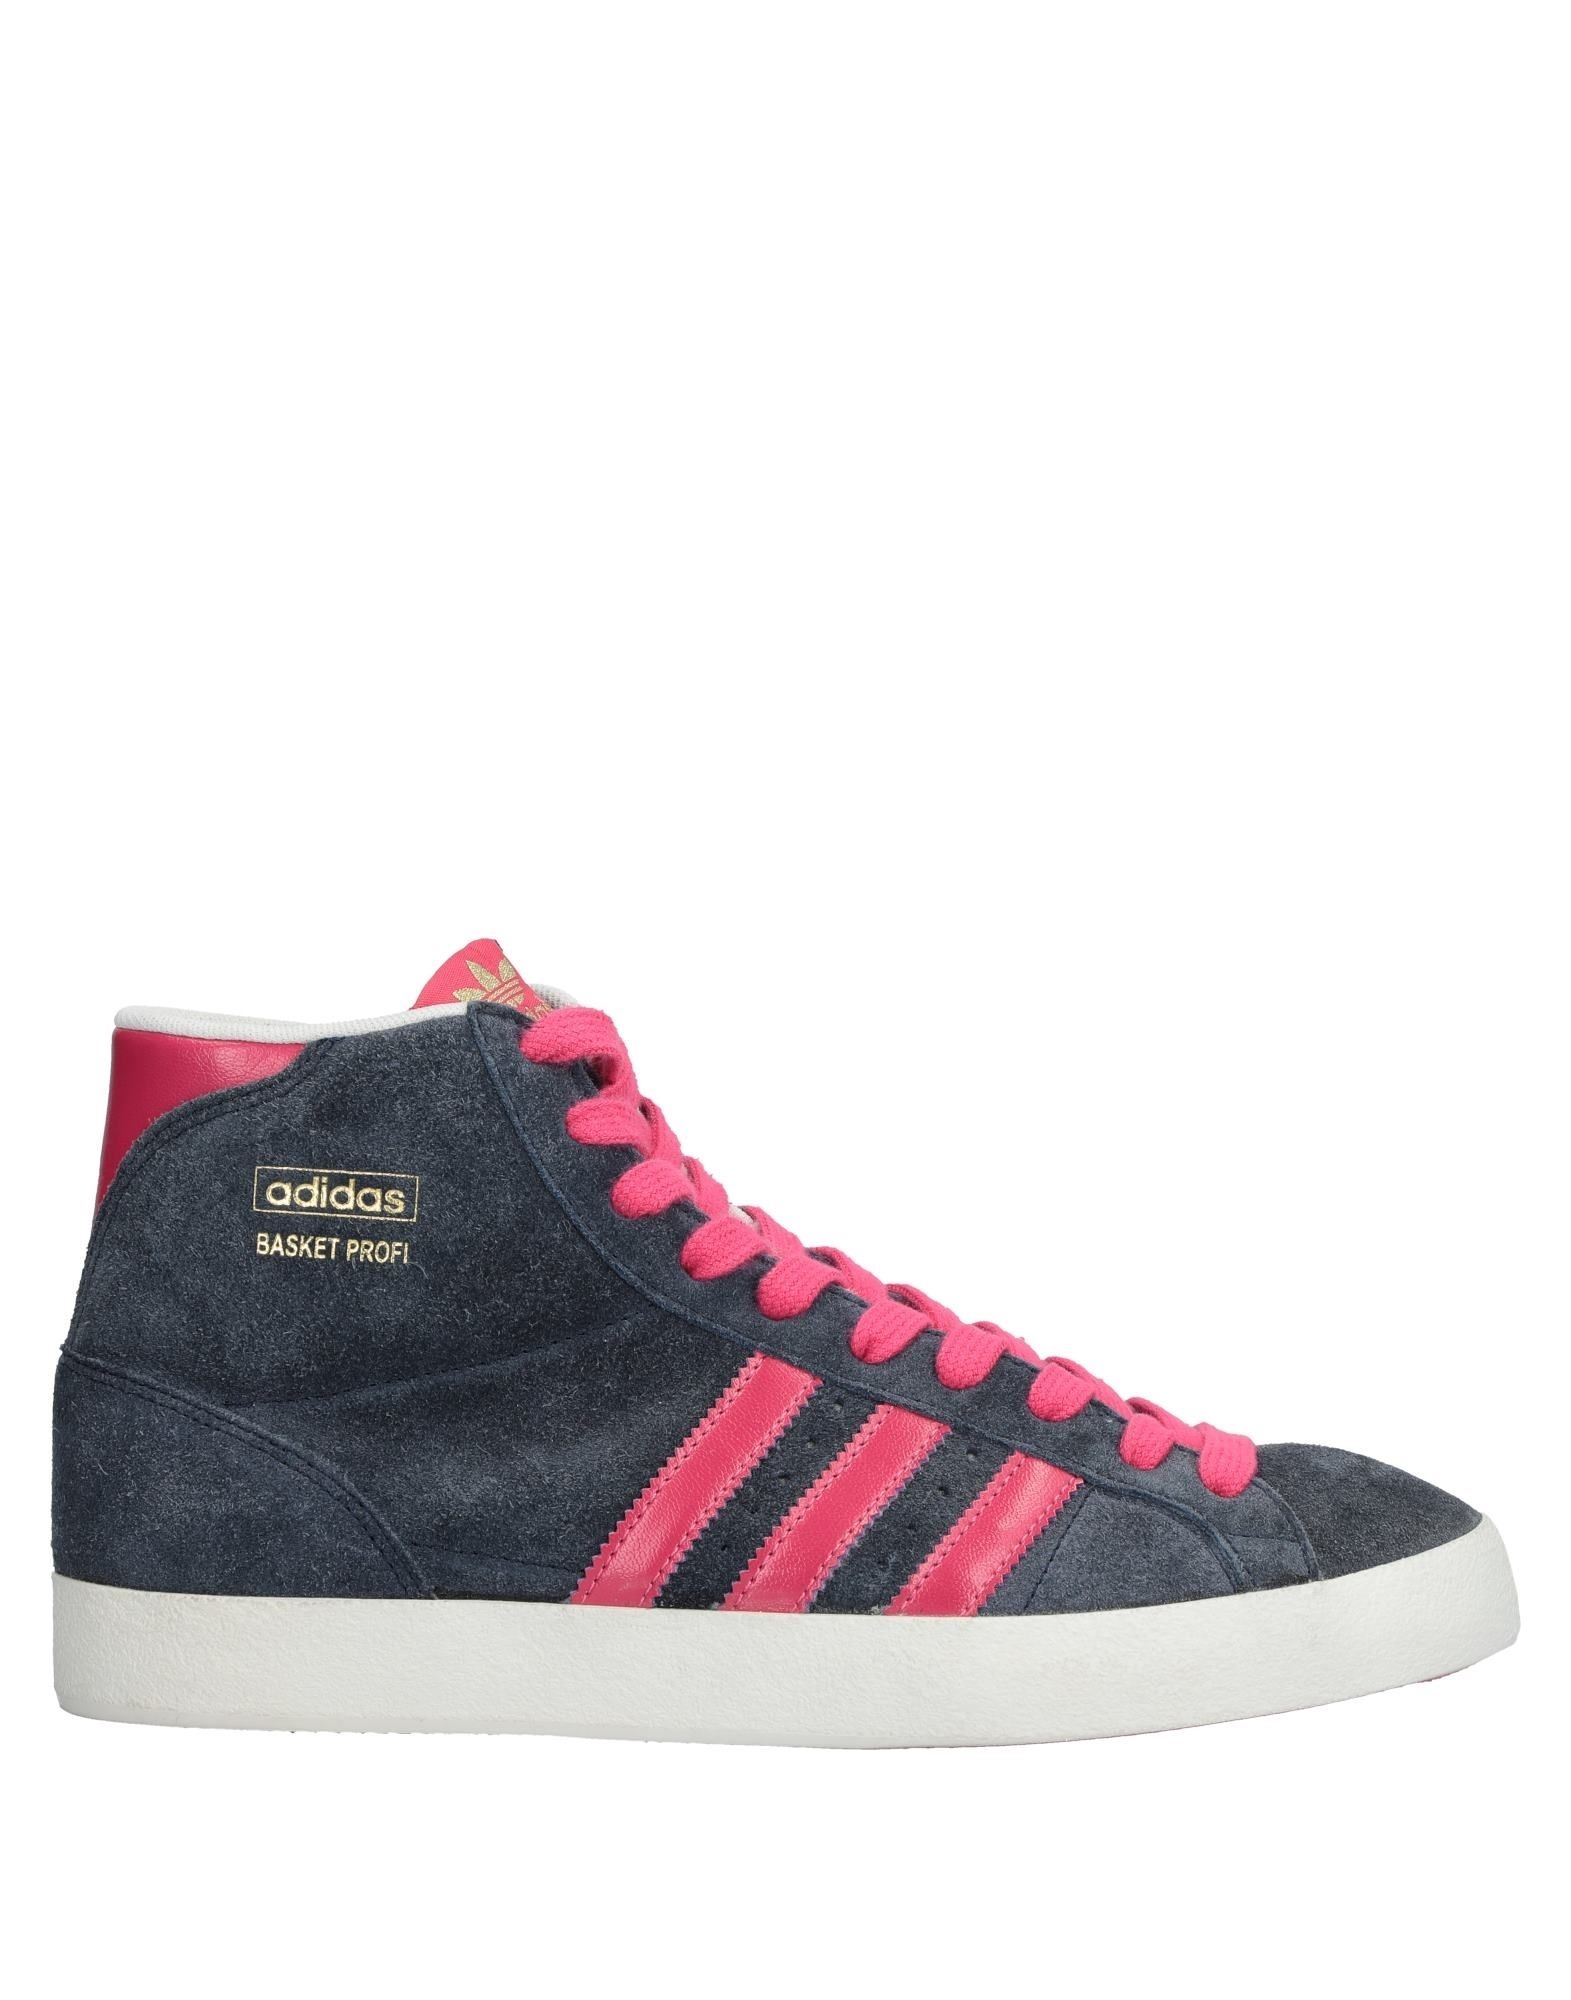 Sneakers Adidas Originals Donna - 11537557LM